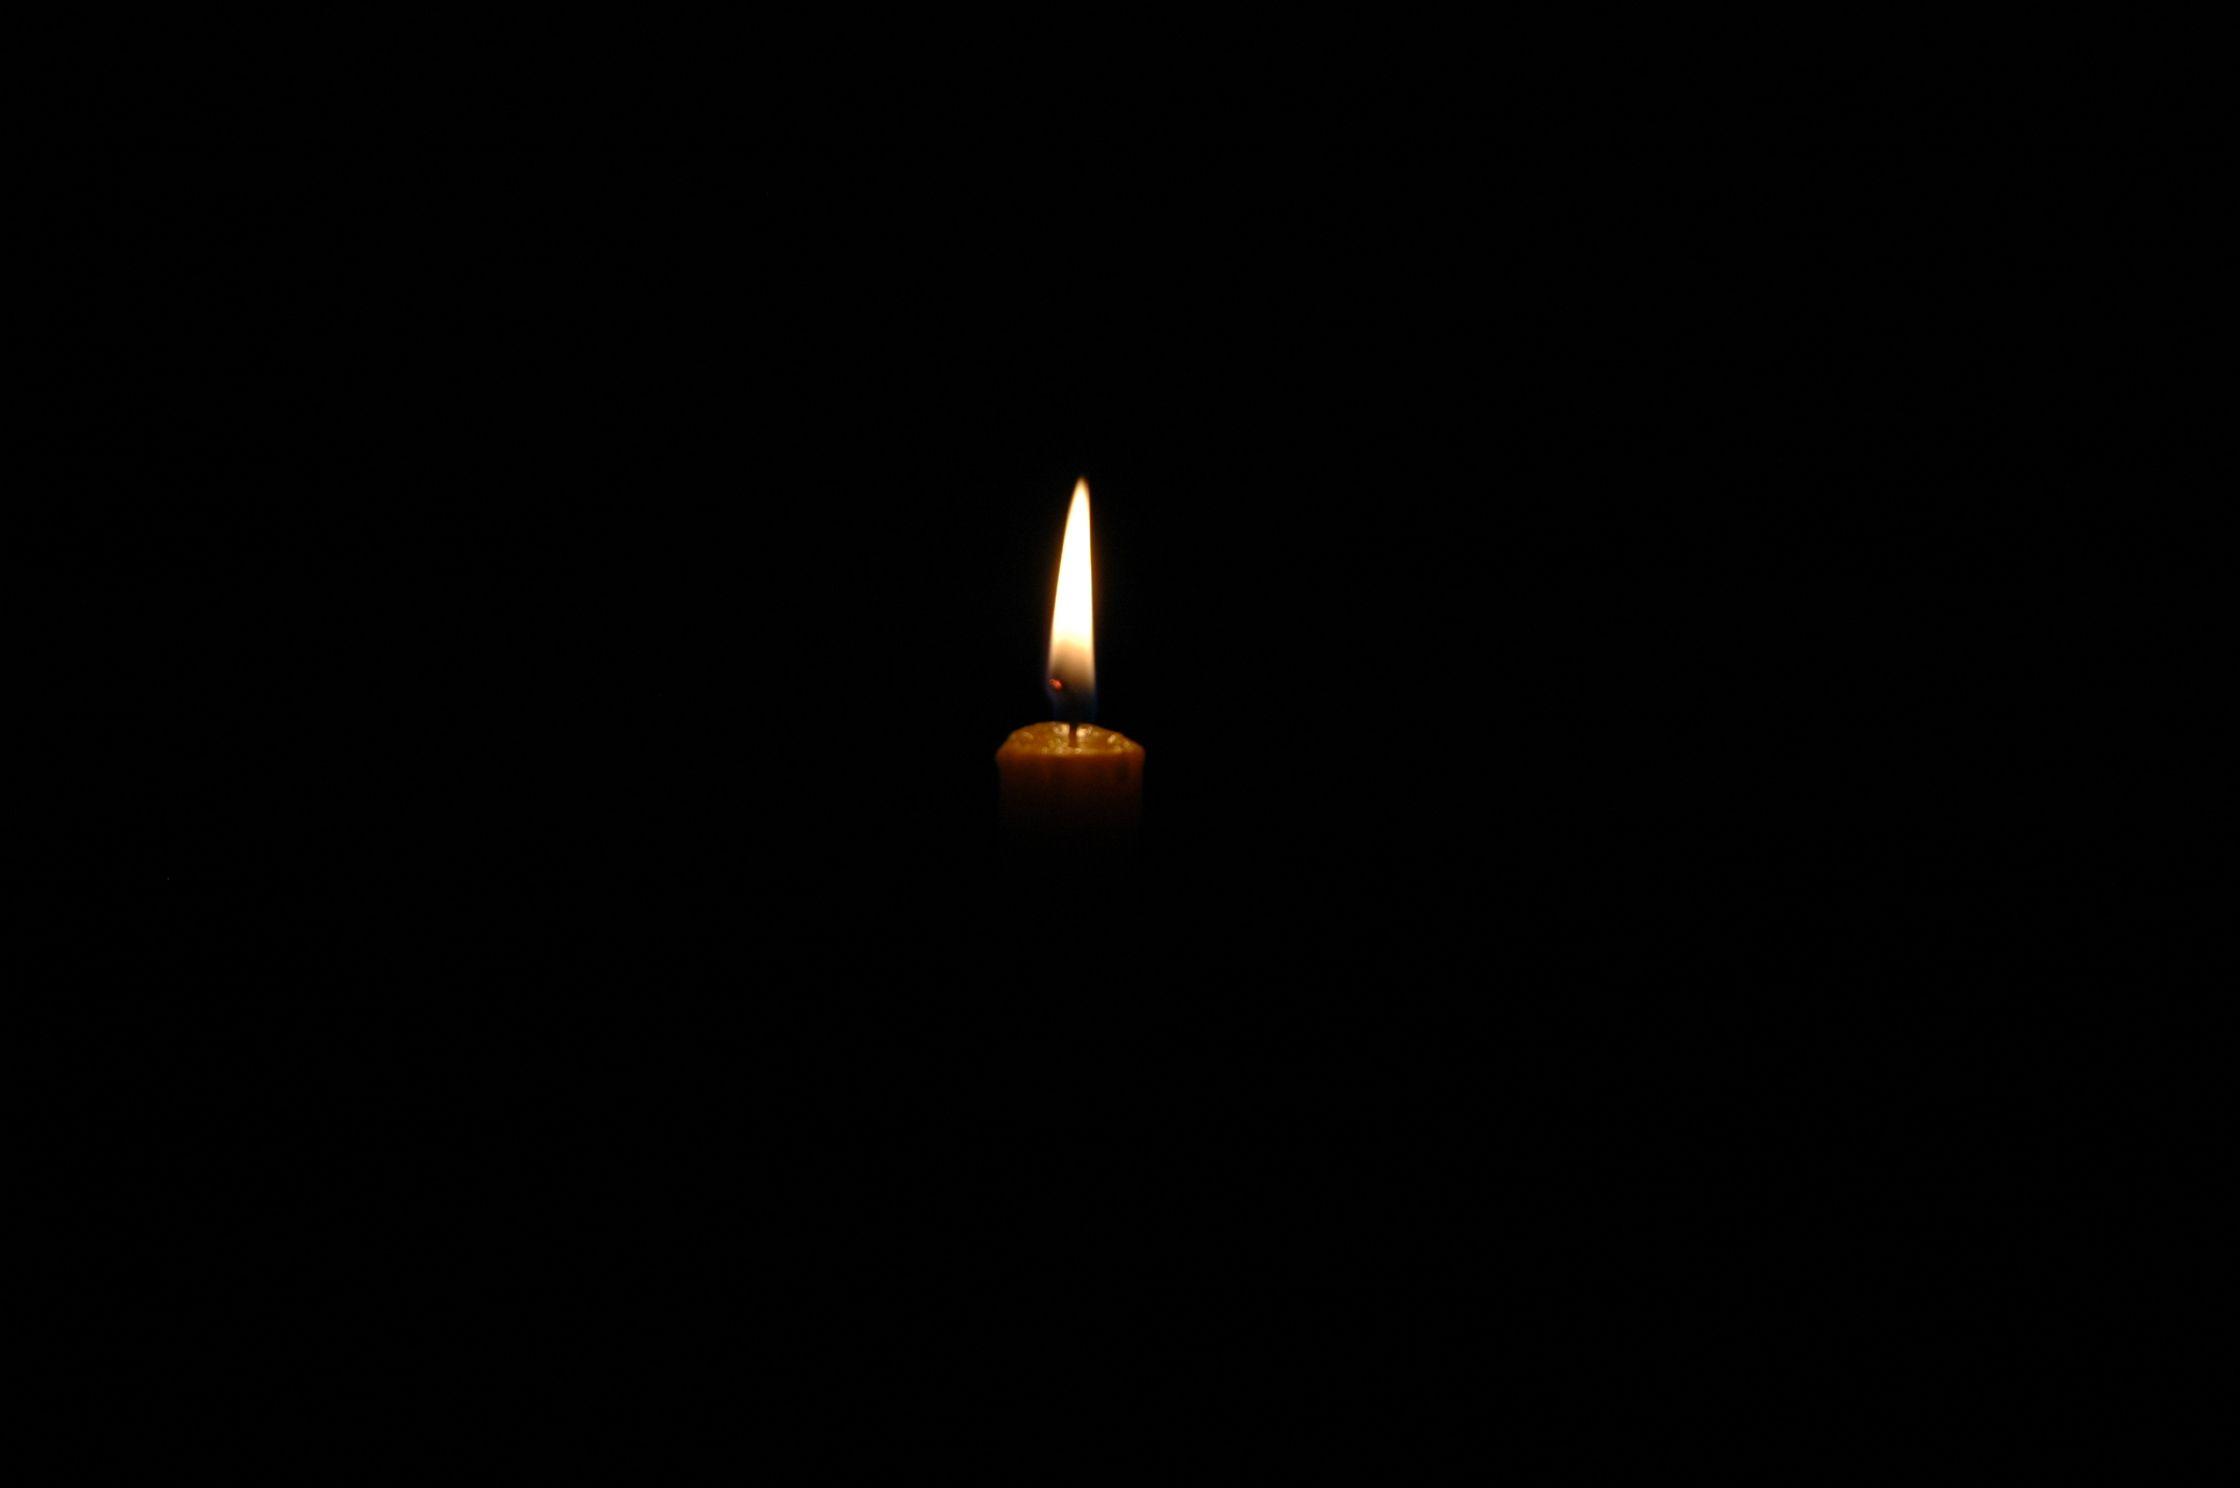 Dark room with light through window - Darkness